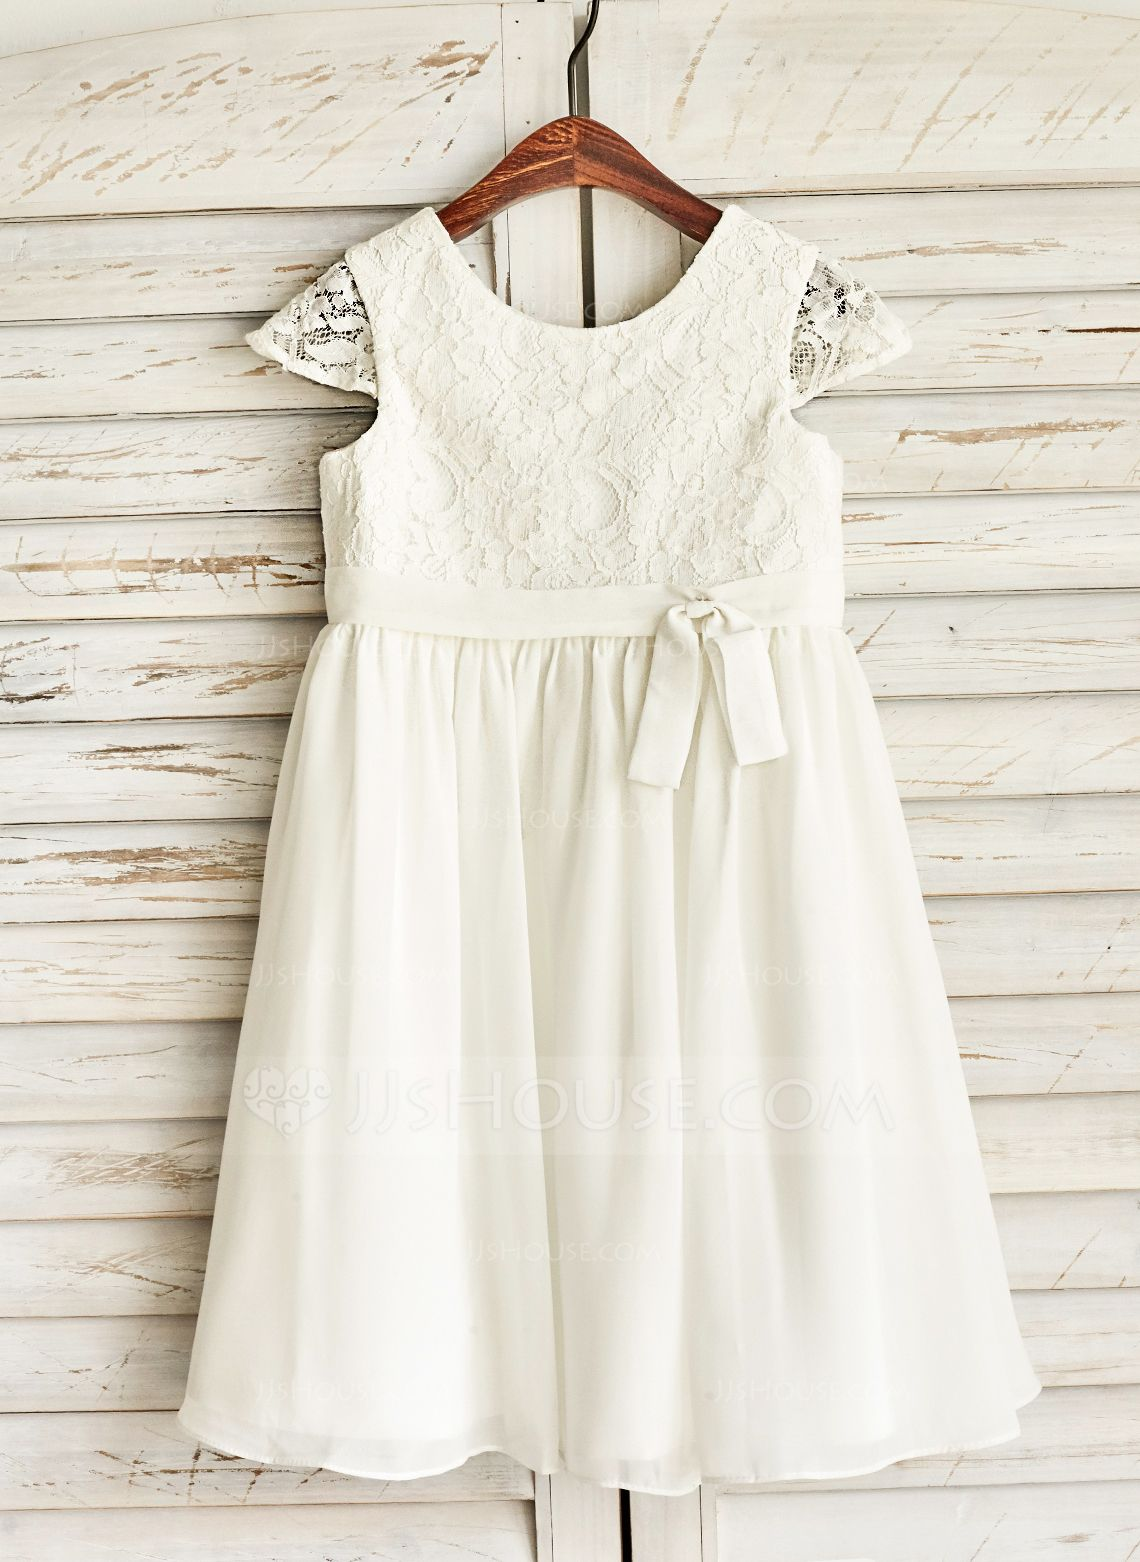 42bb69464 A-Line/Princess Knee-length Flower Girl Dress - Chiffon Sleeveless Scoop  Neck With Bow(s) (010091213) - Flower Girl Dresses - JJ's House